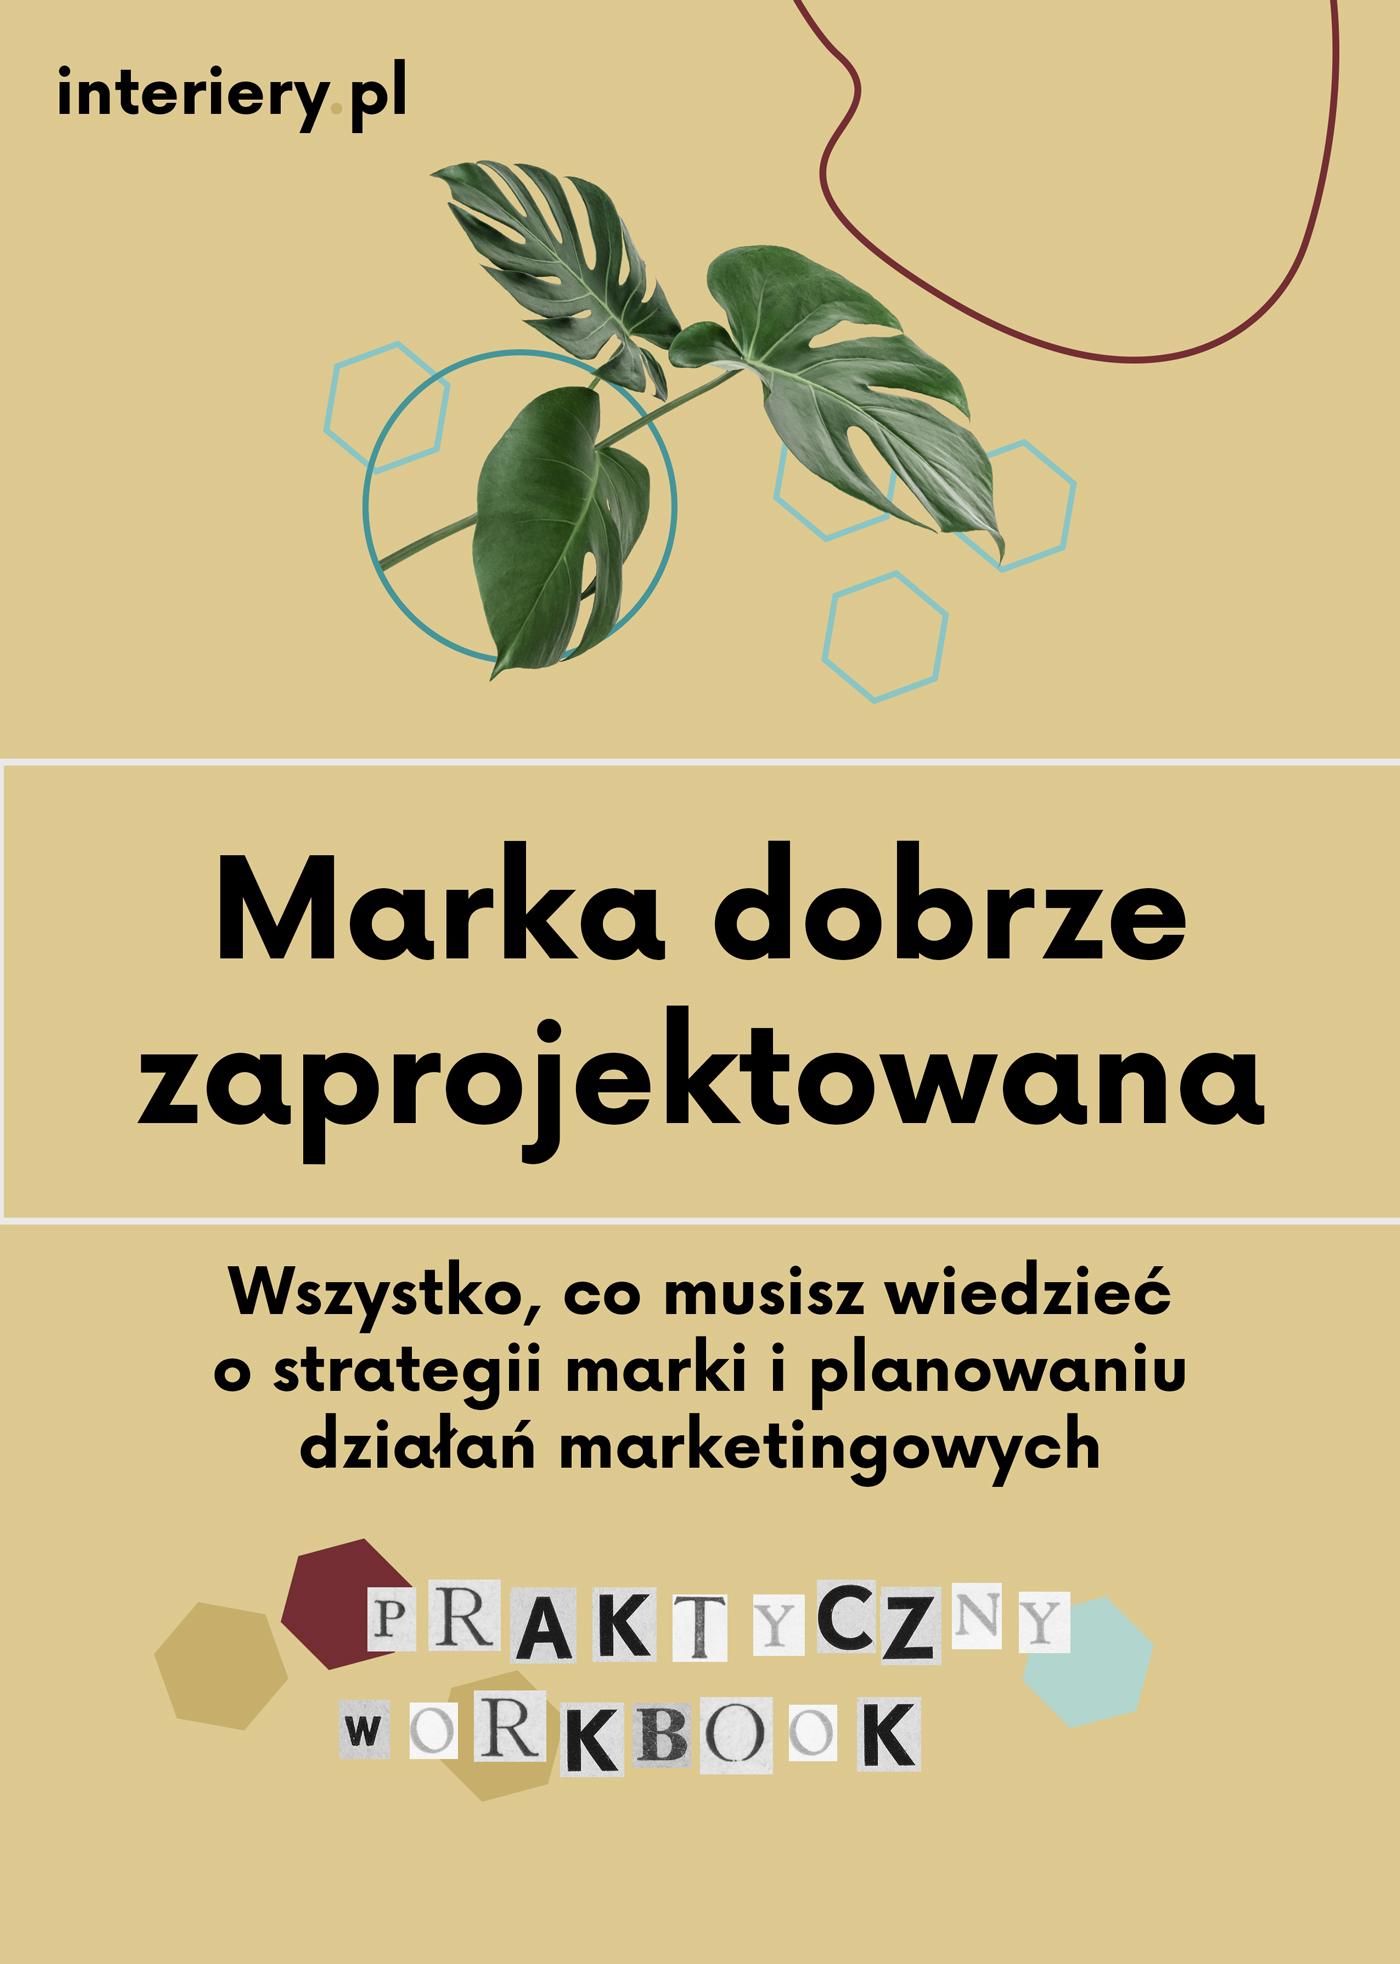 Okładka ebooka dla interiery.pl